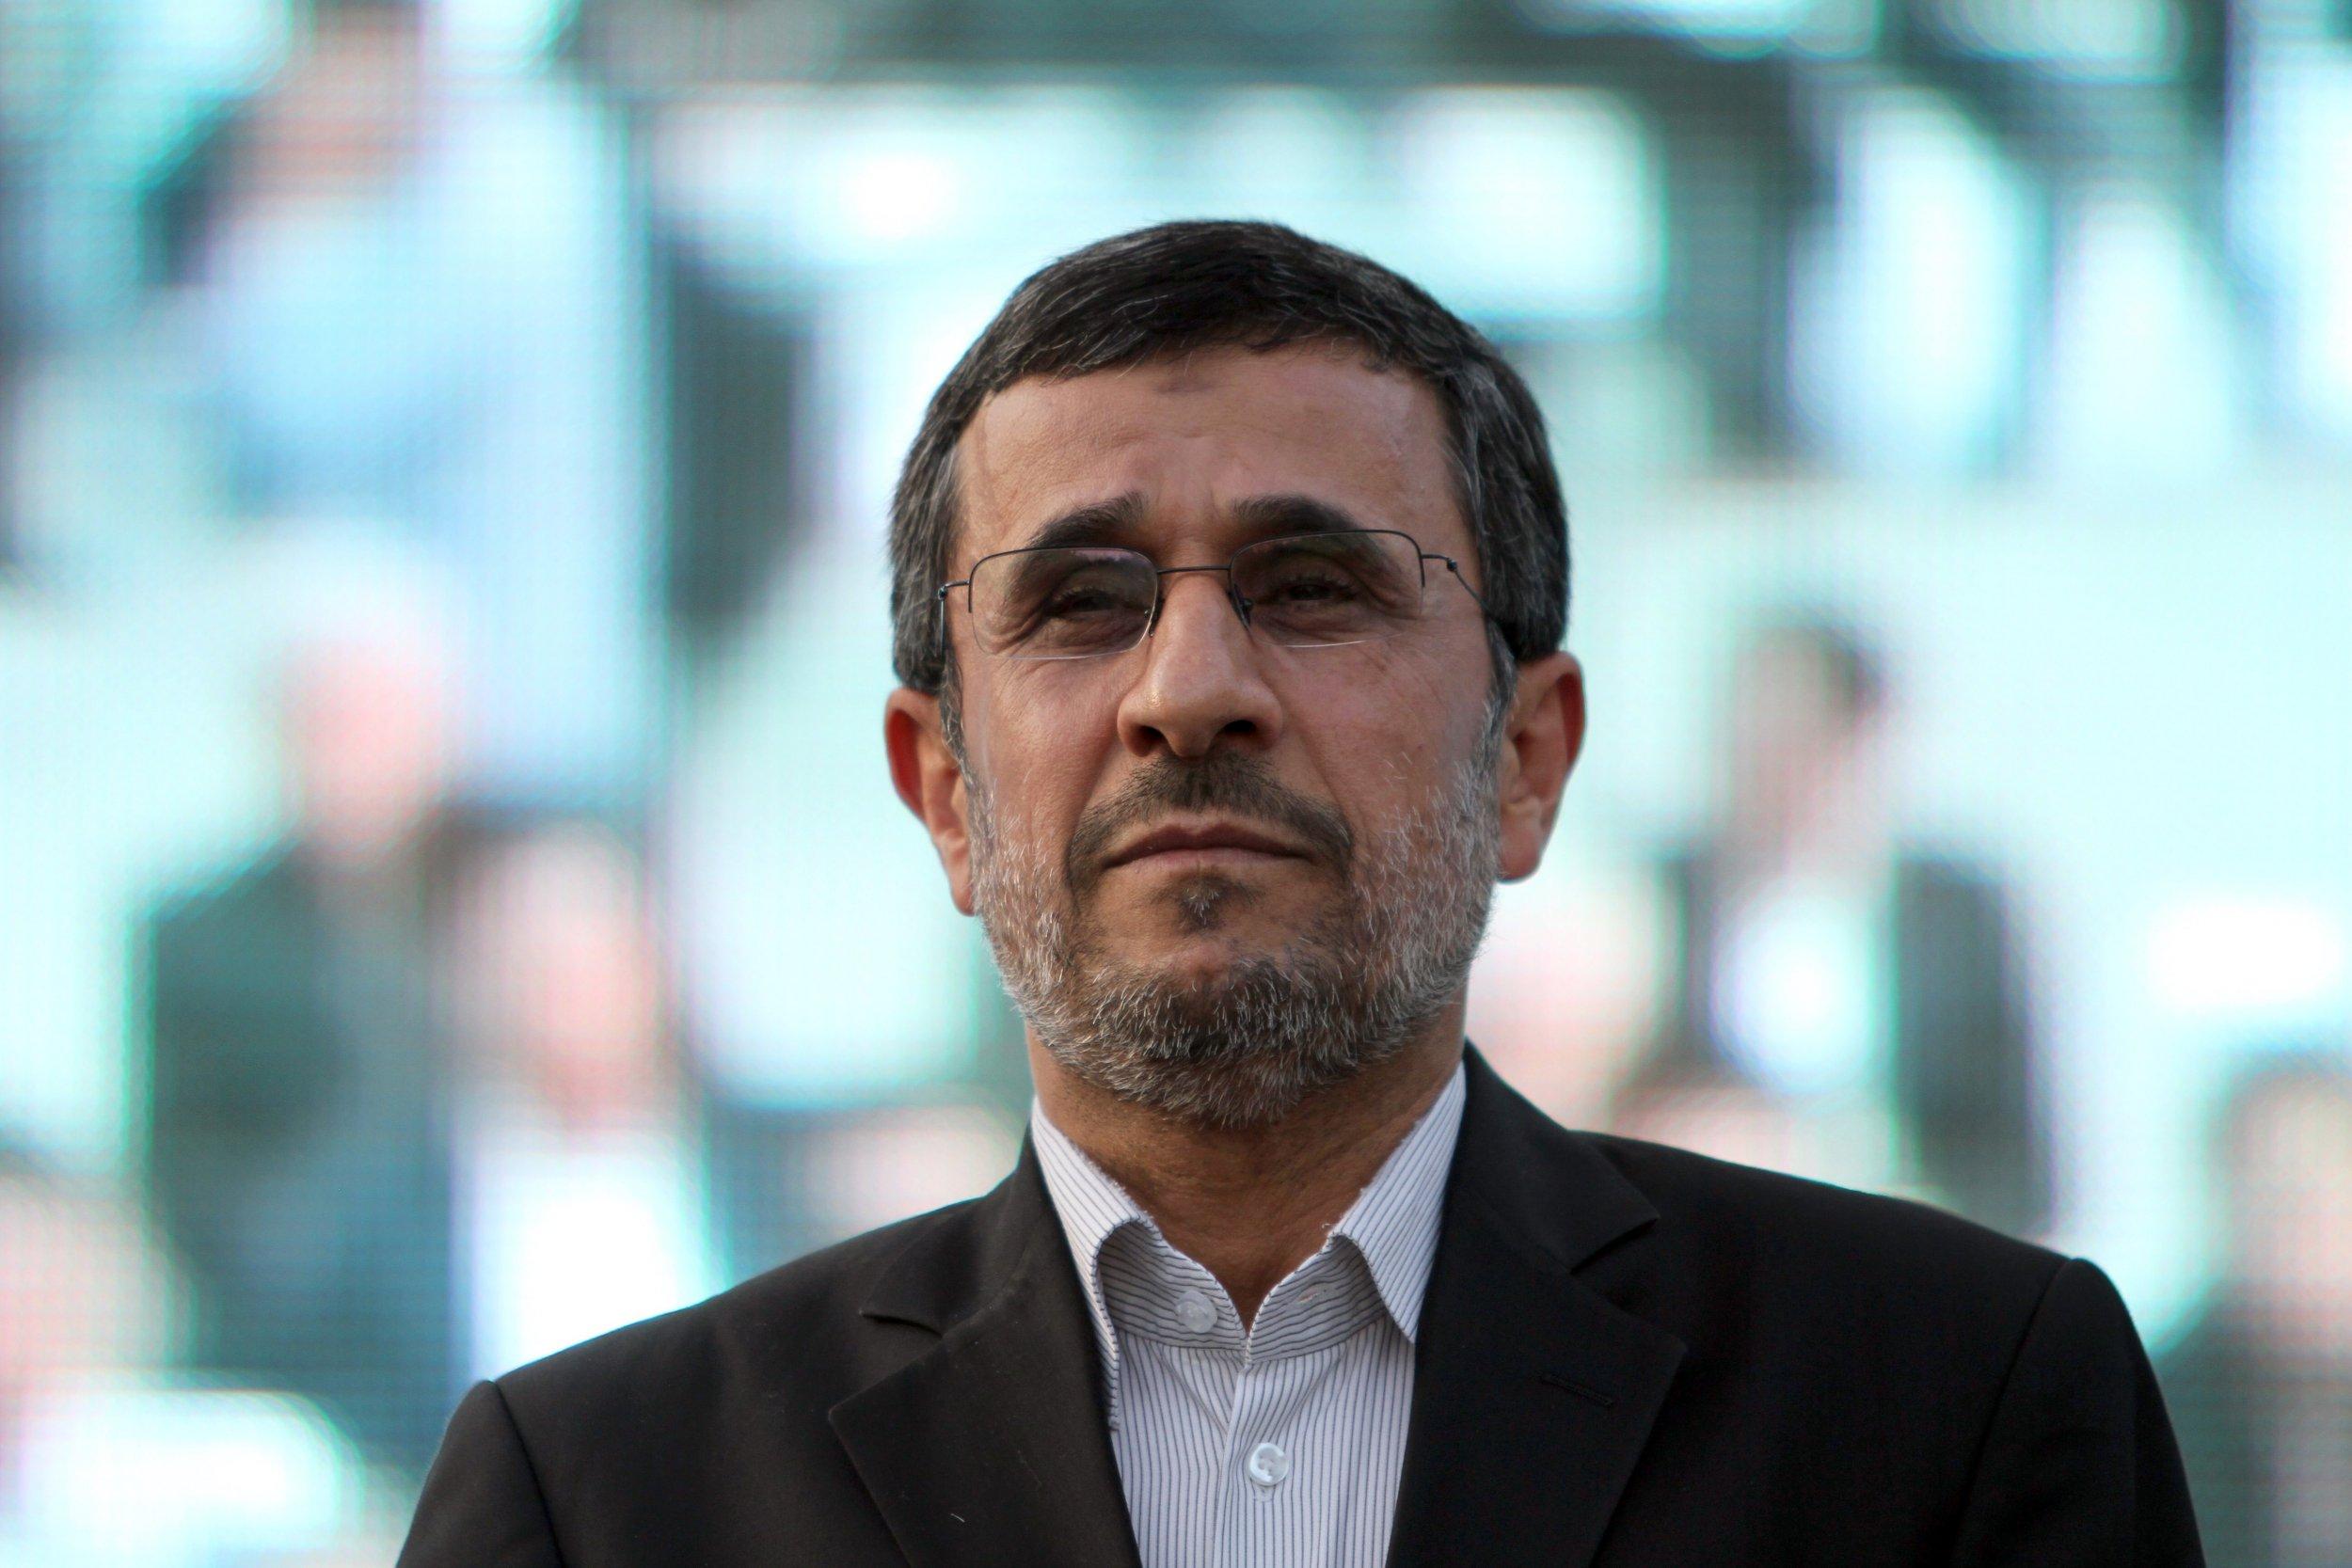 Former Iranian President Mahmoud Ahmadinejad